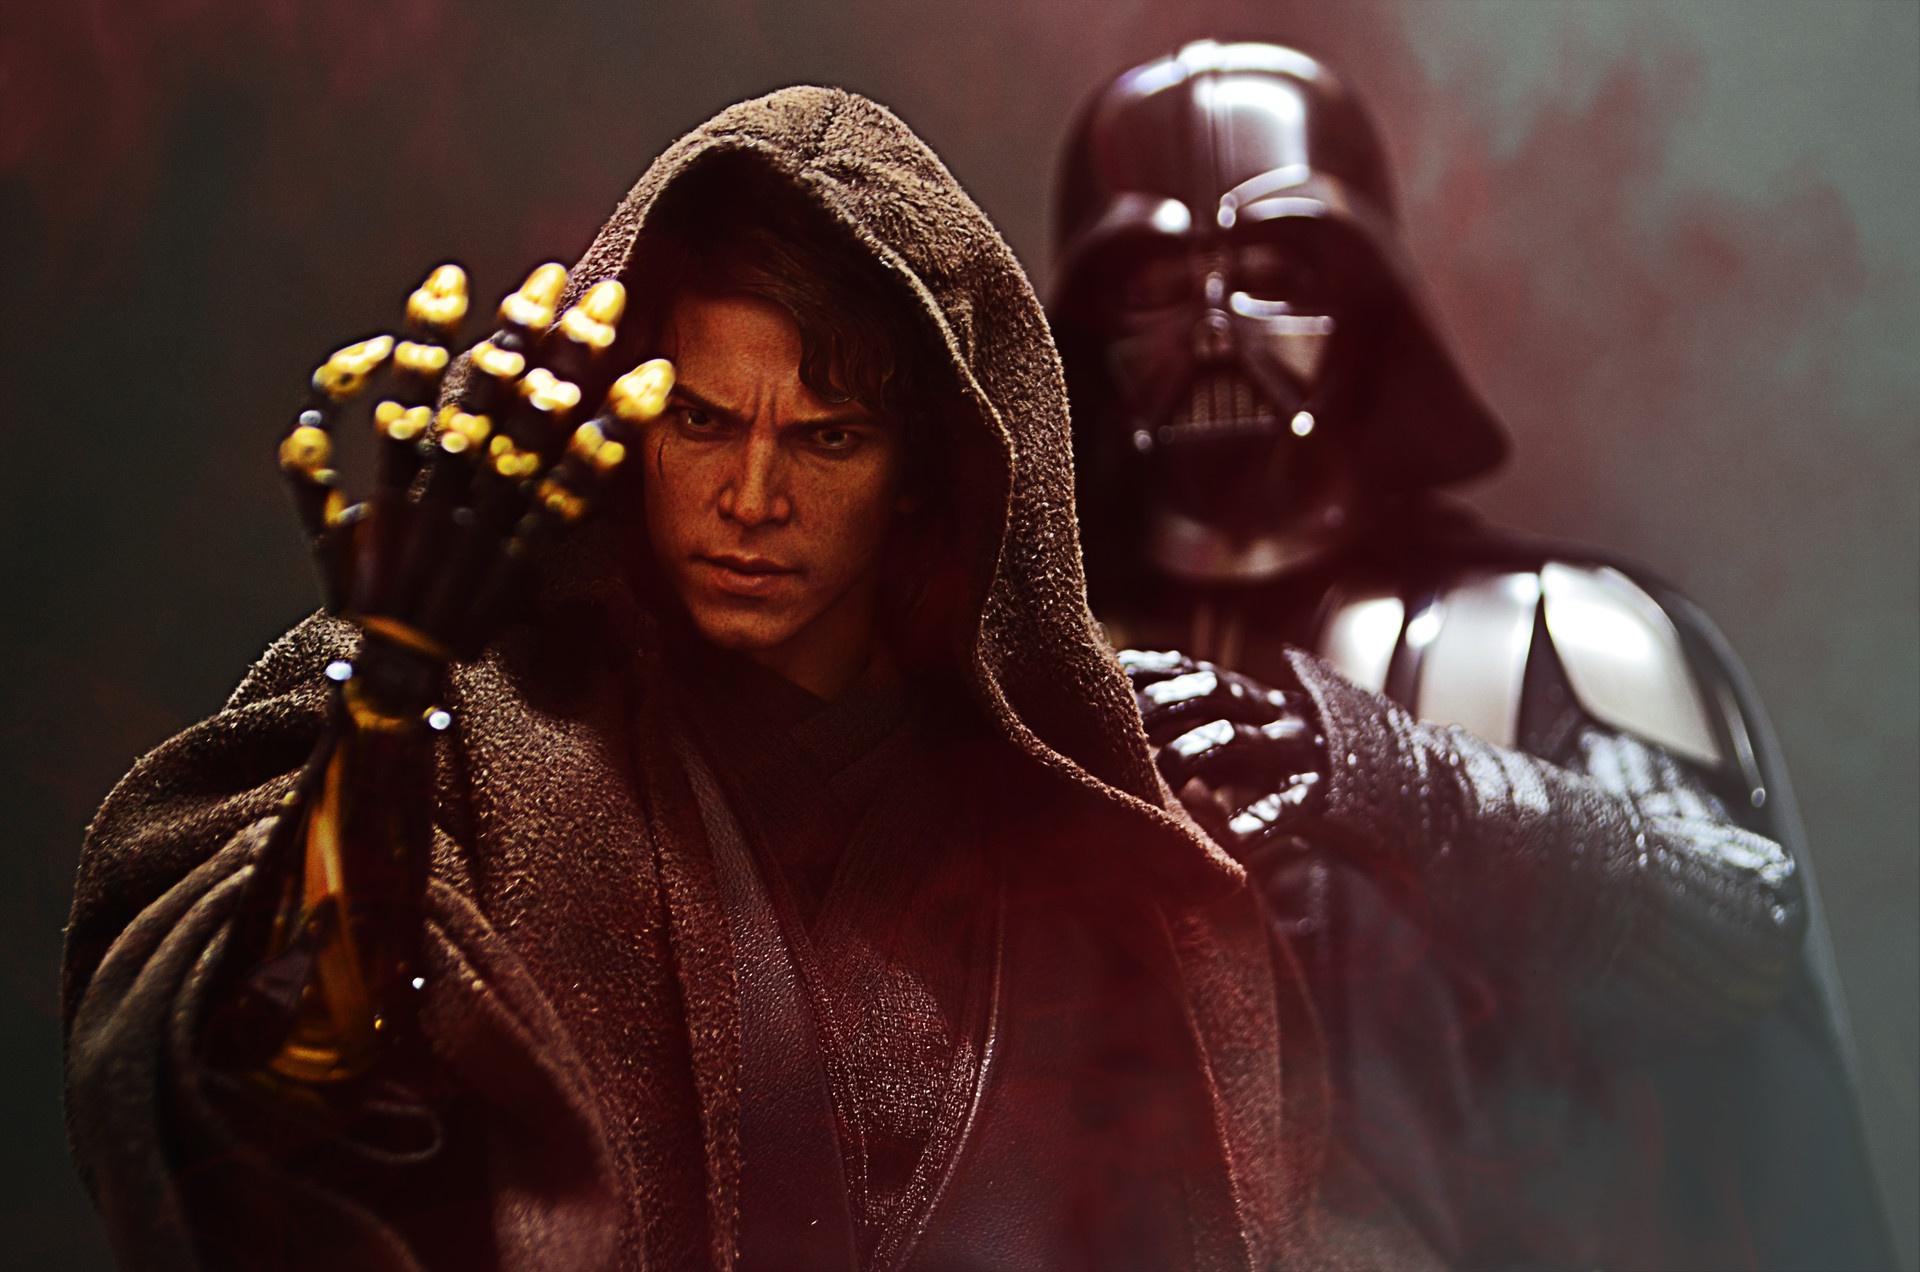 General 1920x1272 Darth Vader Anakin Skywalker Star Wars science fiction Star Wars Villains Star Wars Heroes